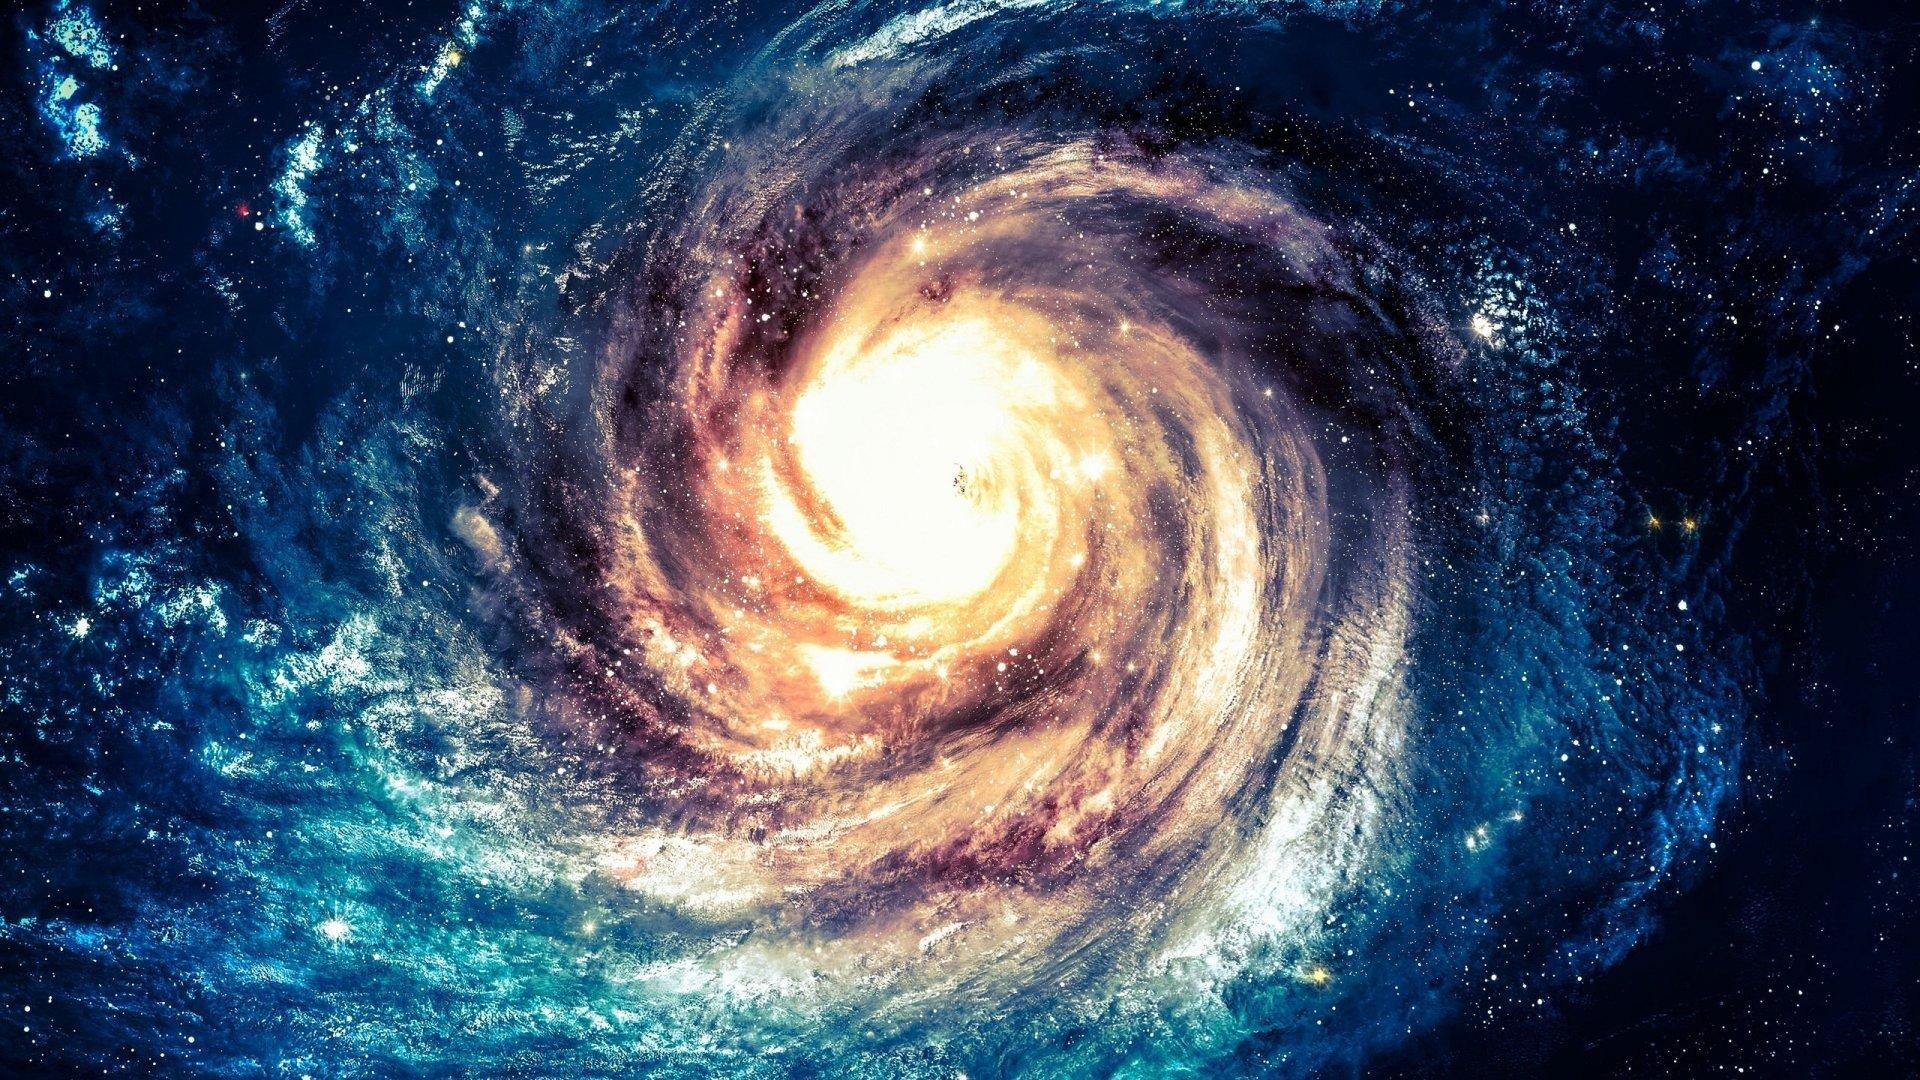 space, Stars, Nebula, Galaxy, Space art, Spiral galaxy ...